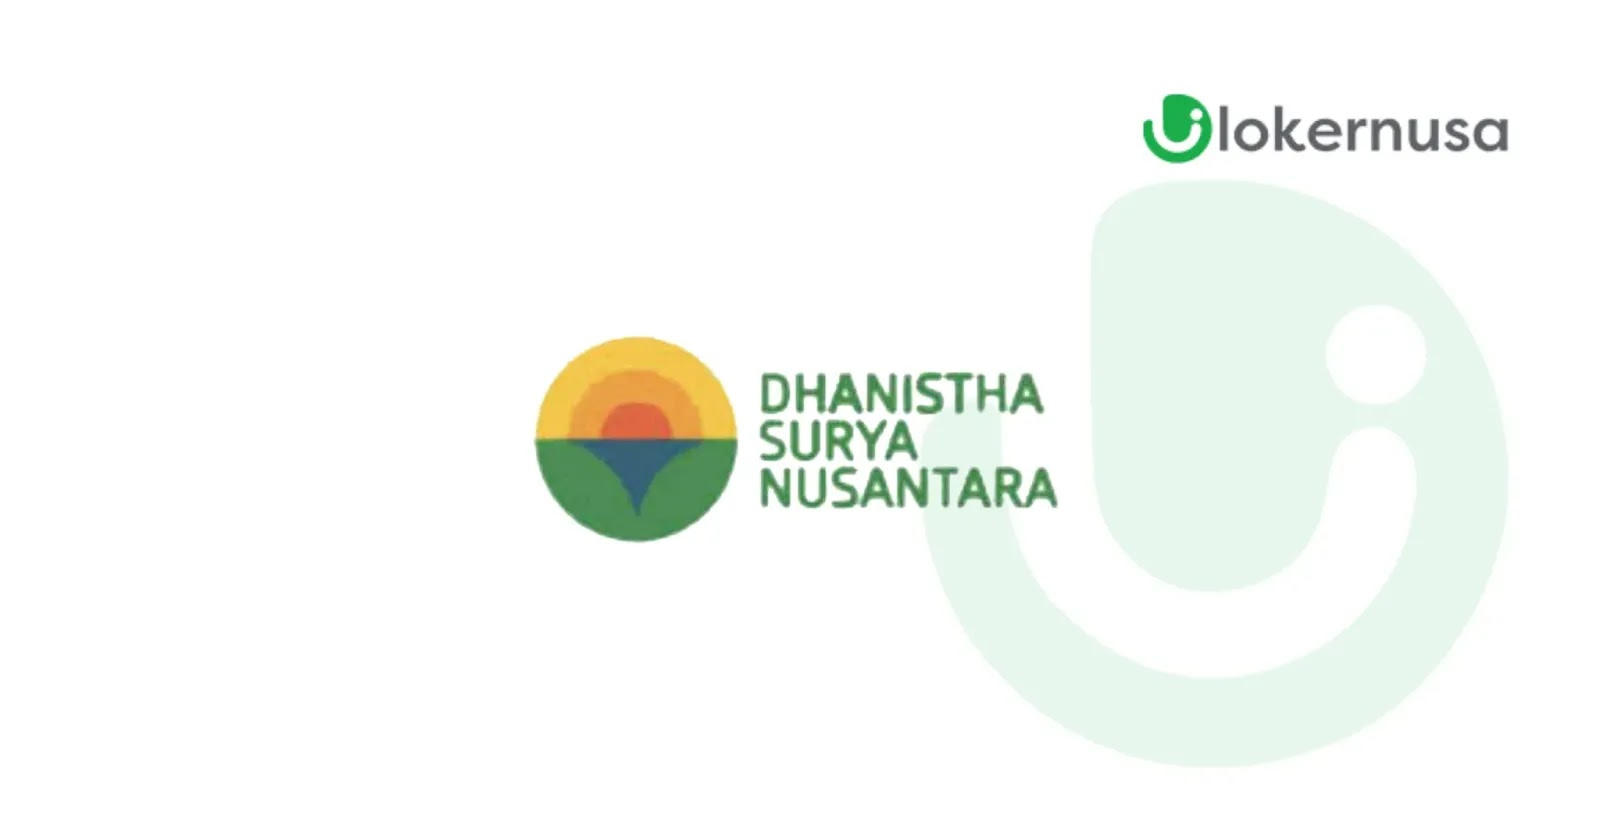 Lowongan Kerja PT Dhanistha Surya Nusantara